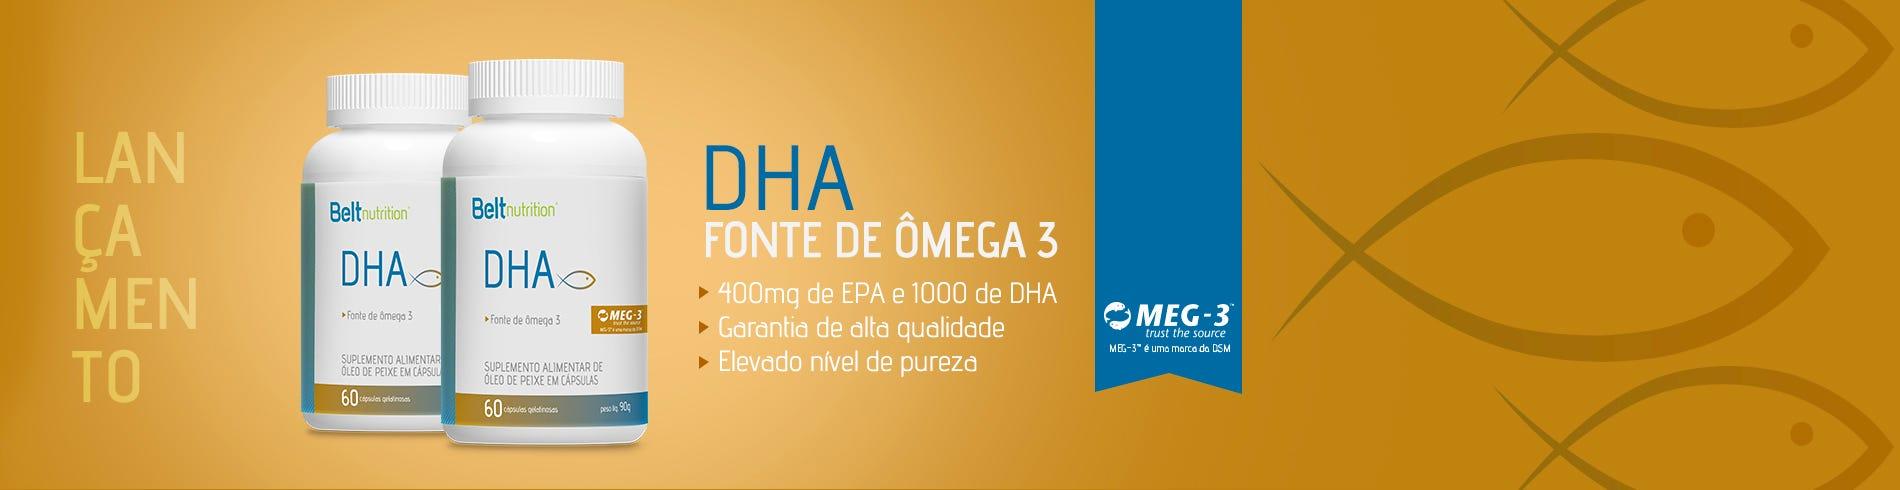 Belt DHA Plus